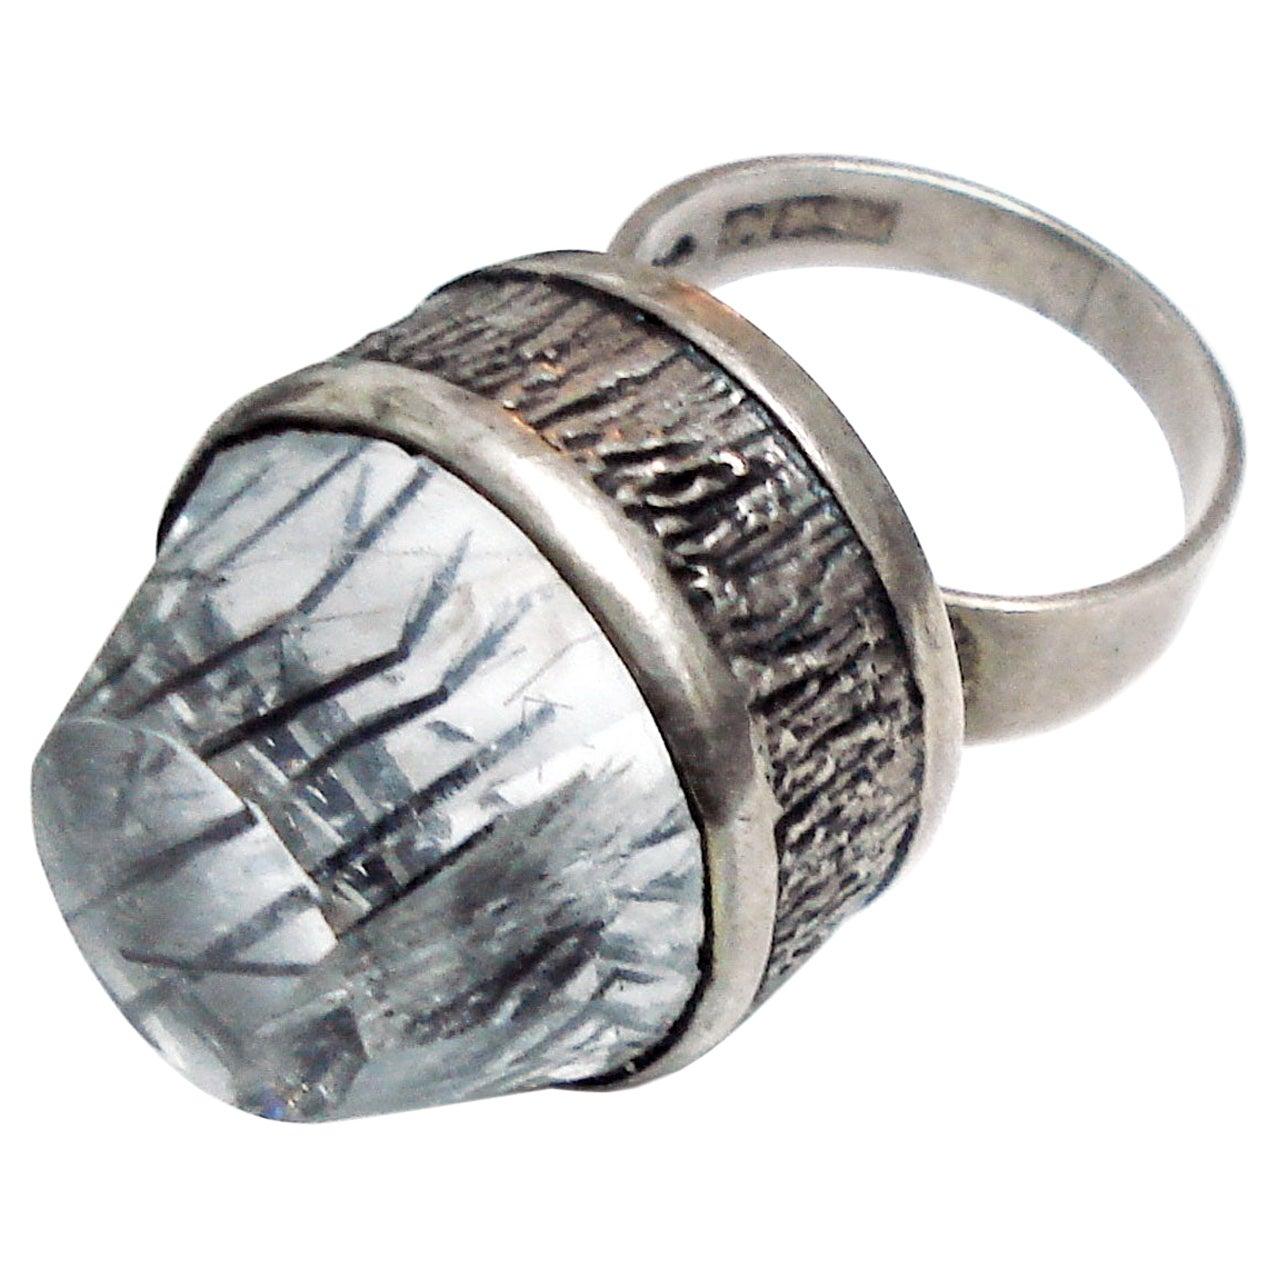 Mid-Century Modern Silver and Rock Crystal Ring, Bengt Hallberg, Sweden, 1969